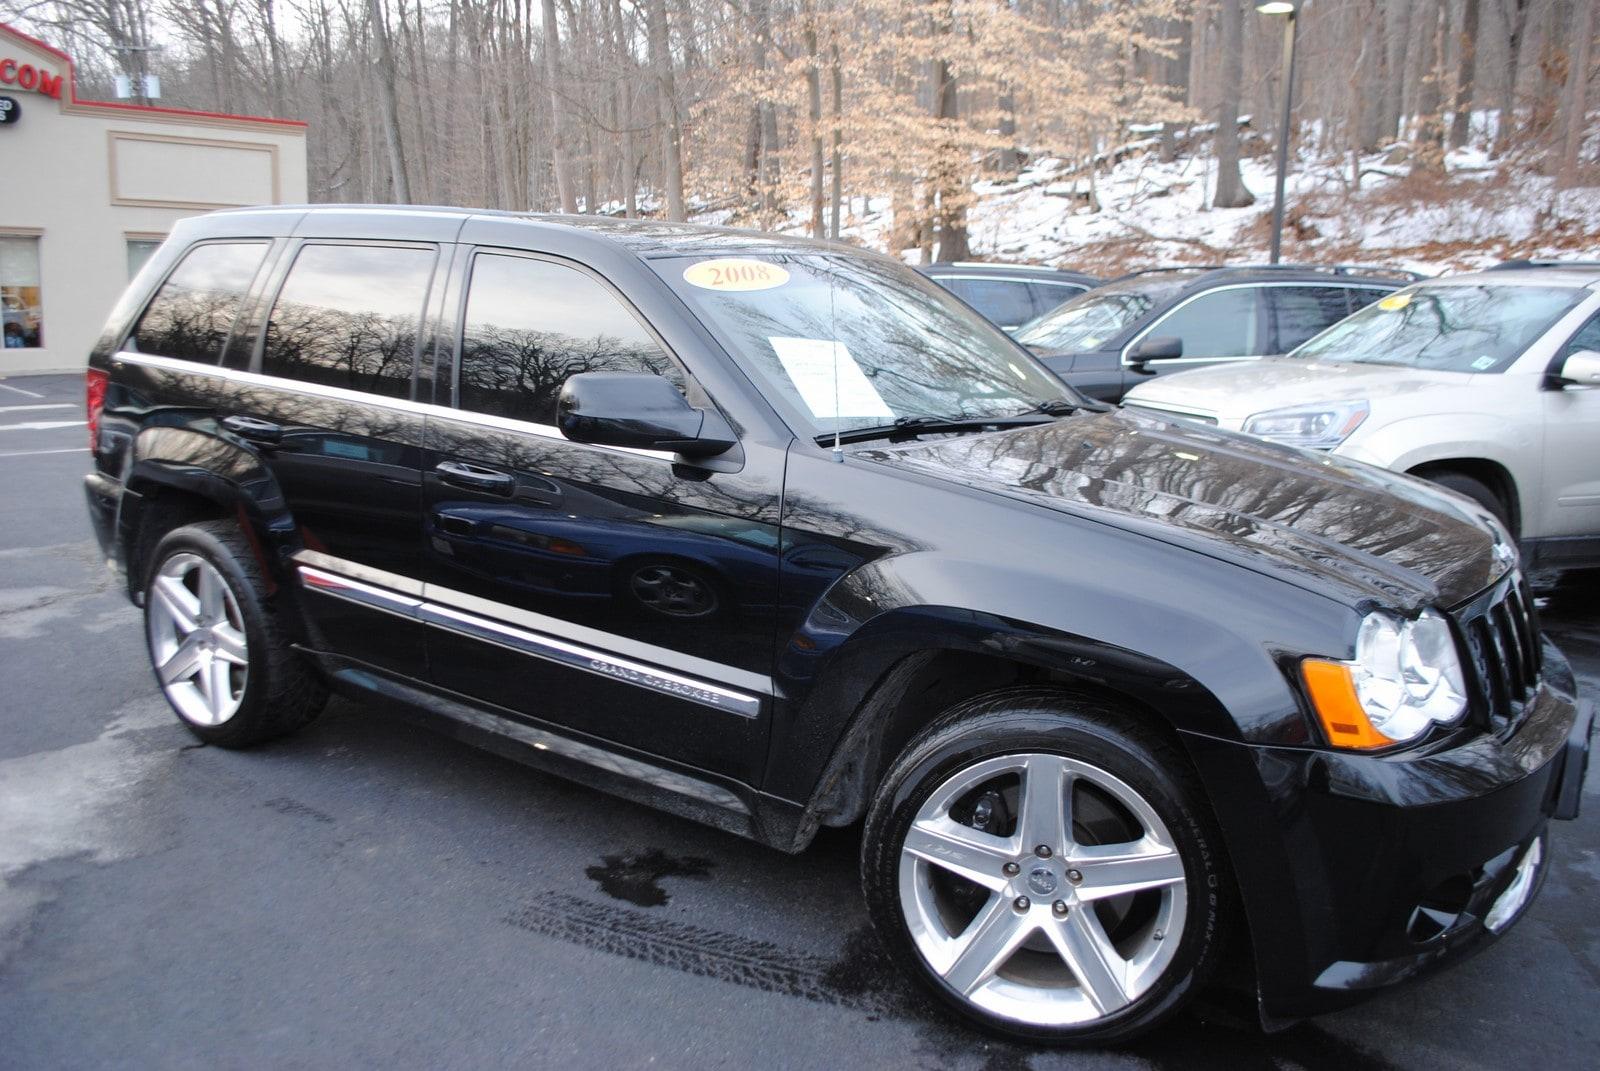 used 2008 jeep grand cherokee for sale west milford nj. Black Bedroom Furniture Sets. Home Design Ideas